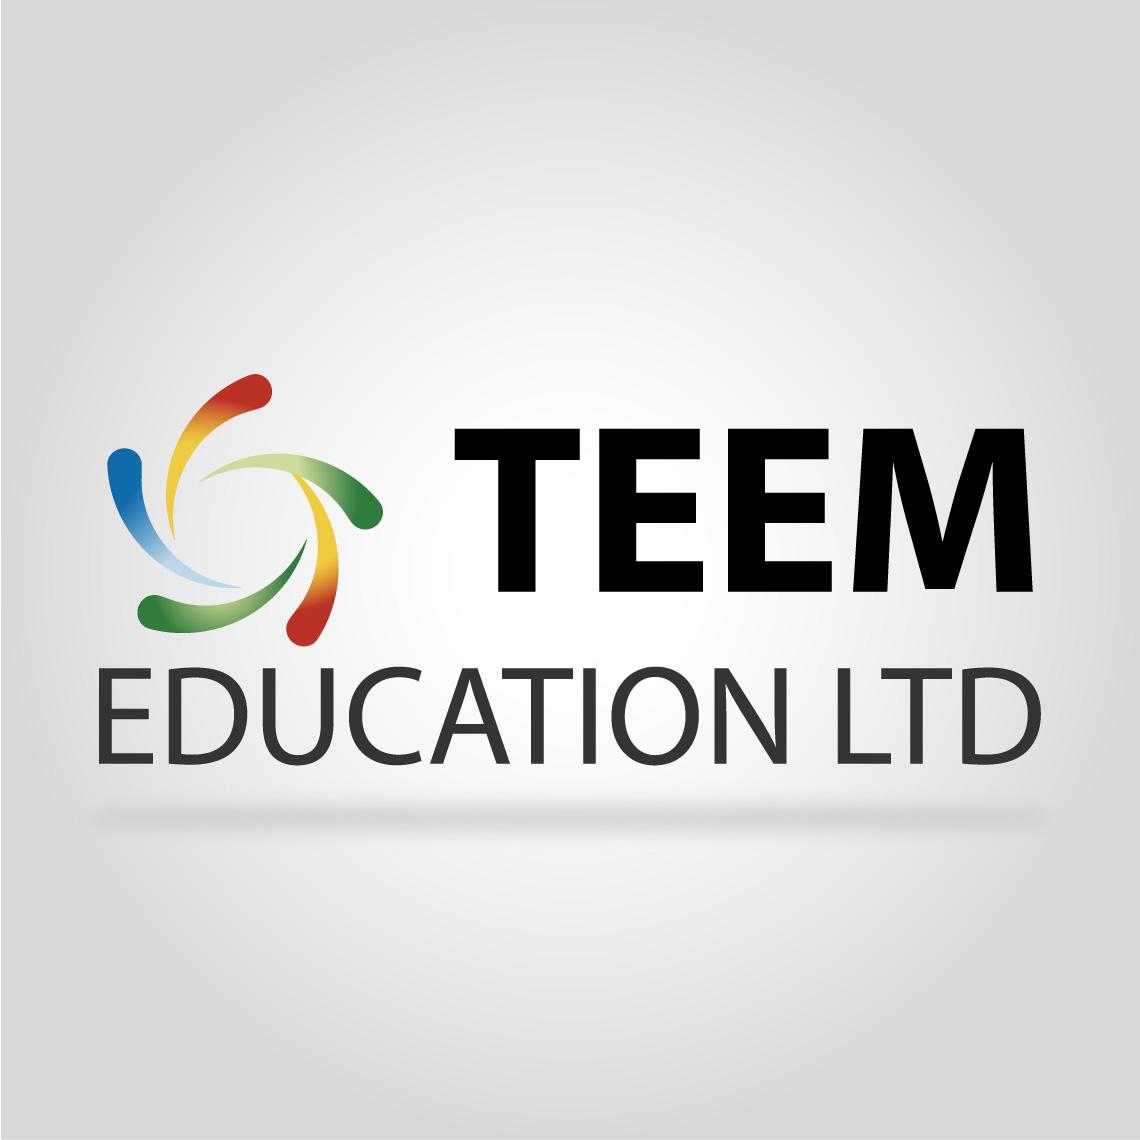 teem education ltd